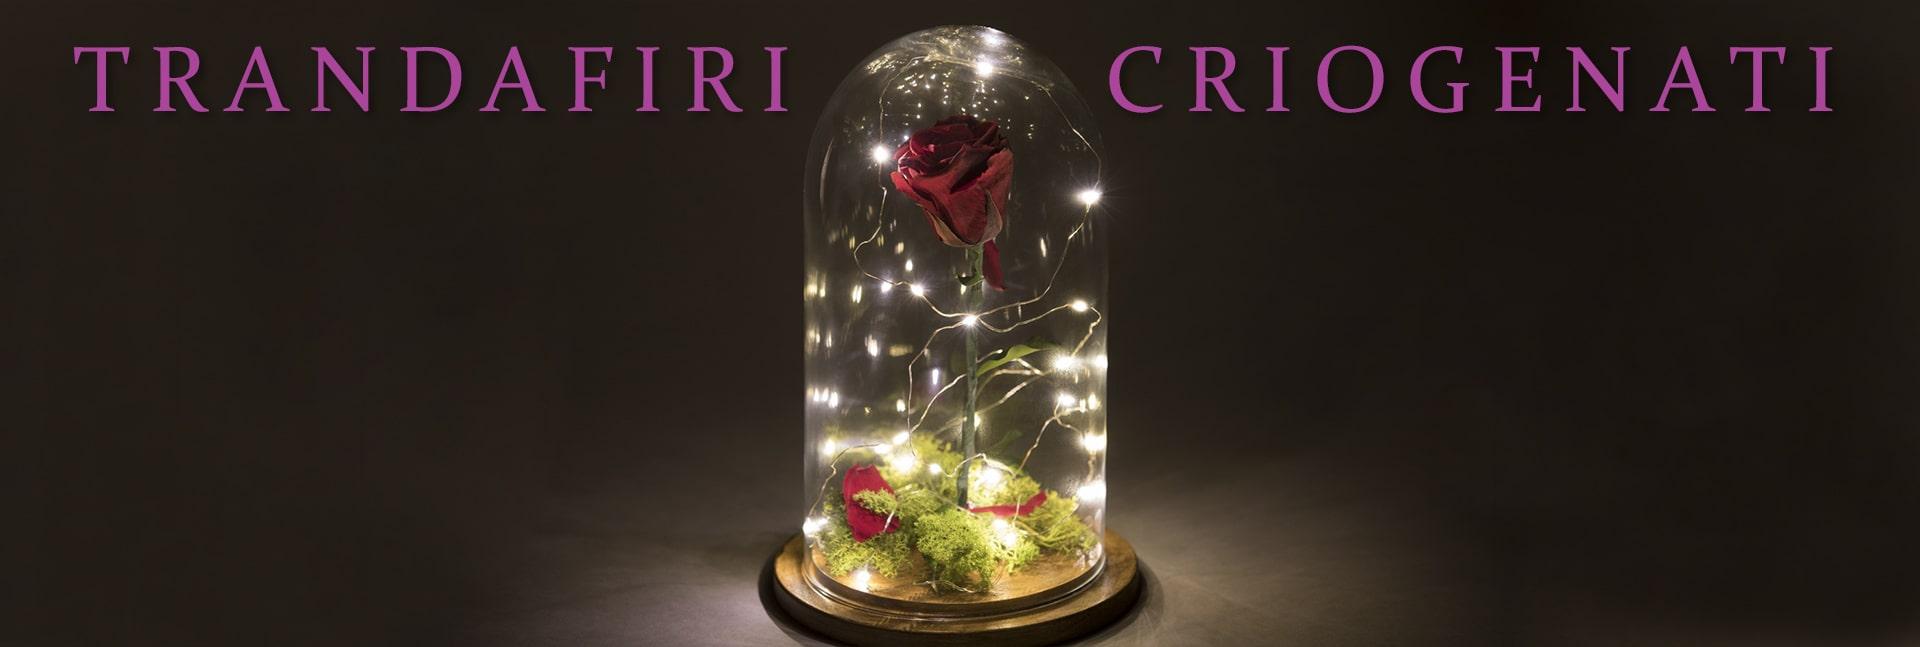 trandafiri-criogenati-1920x647